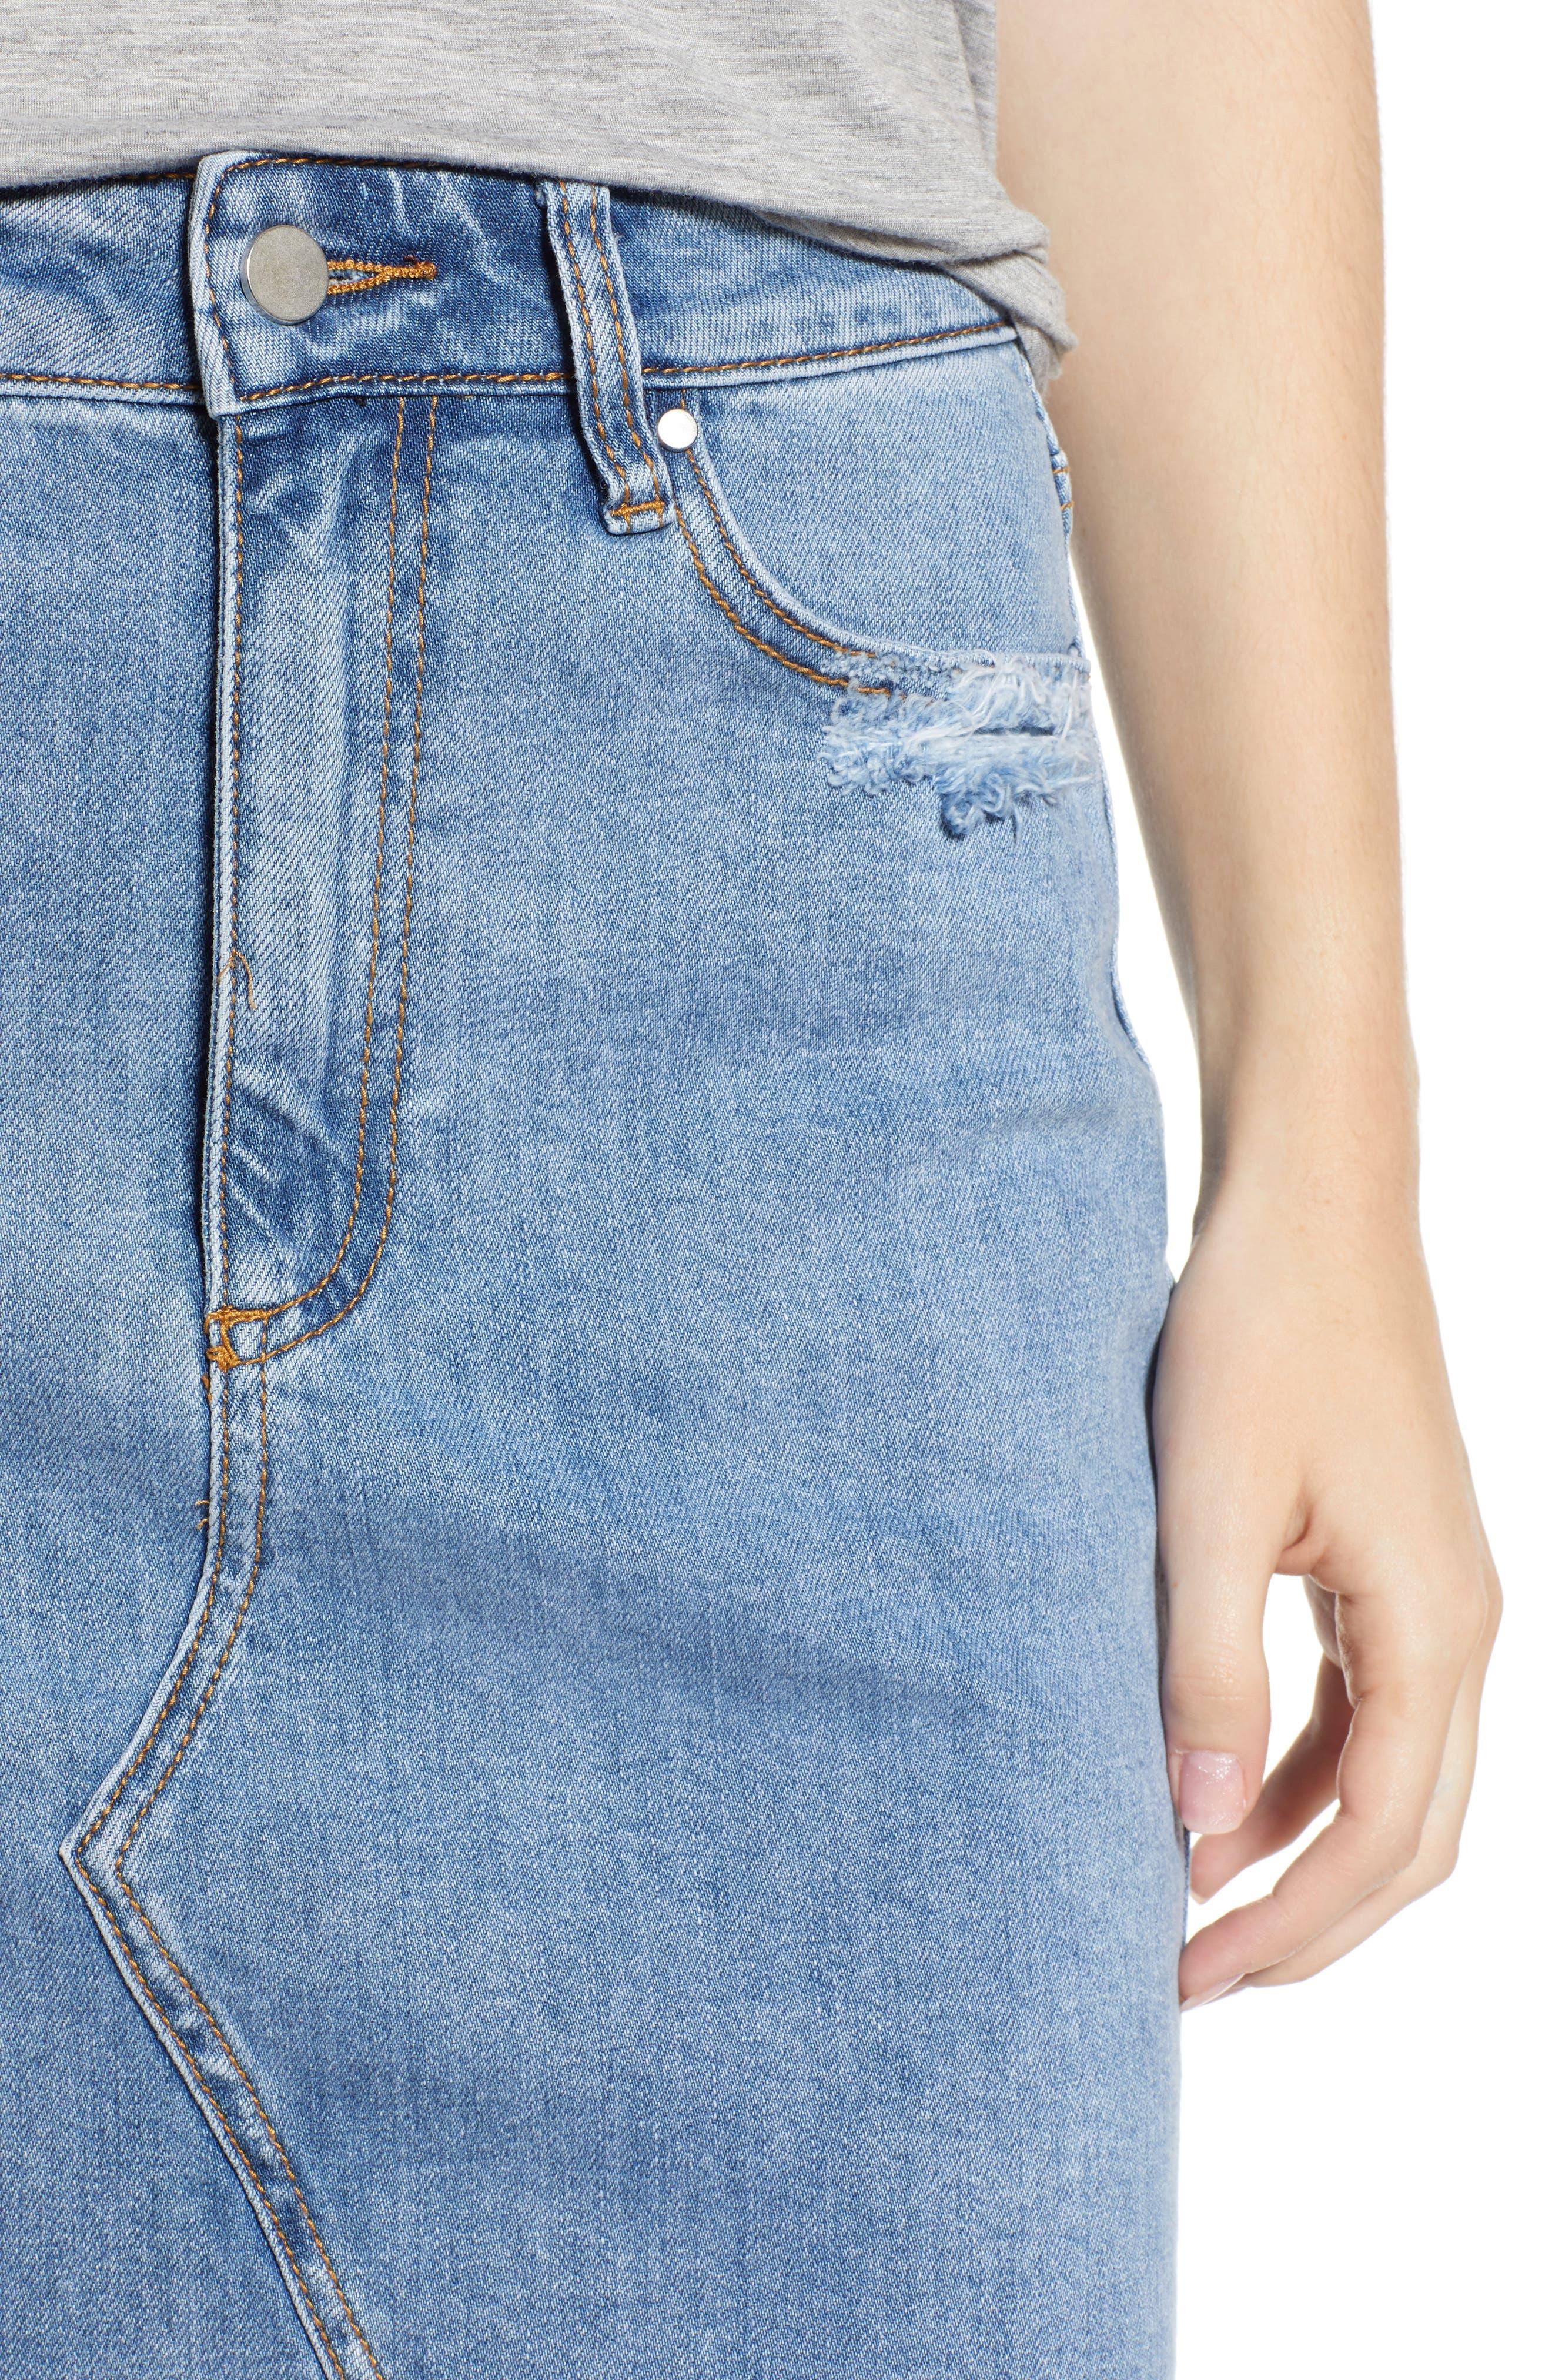 Distressed Denim Skirt,                             Alternate thumbnail 4, color,                             Light Wash